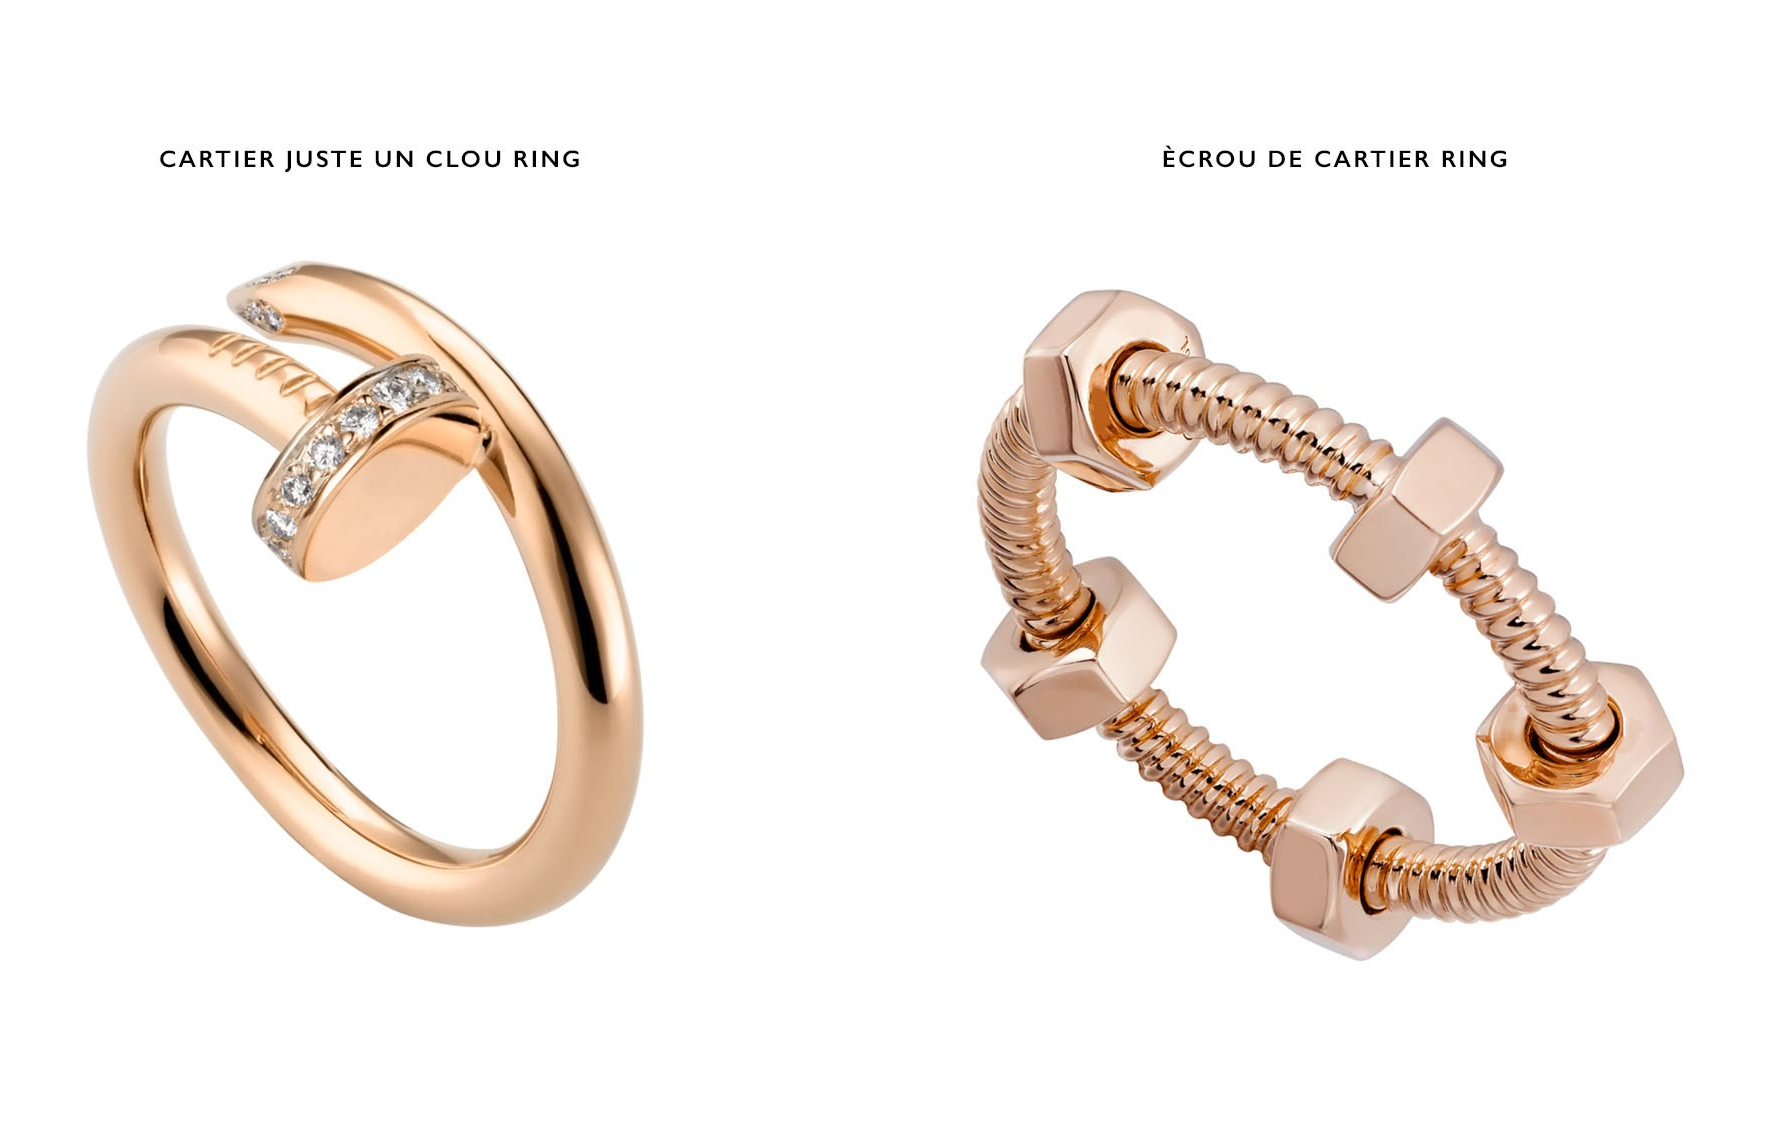 Cartier Juste Un Clou and Ecrou de Cartier Rings